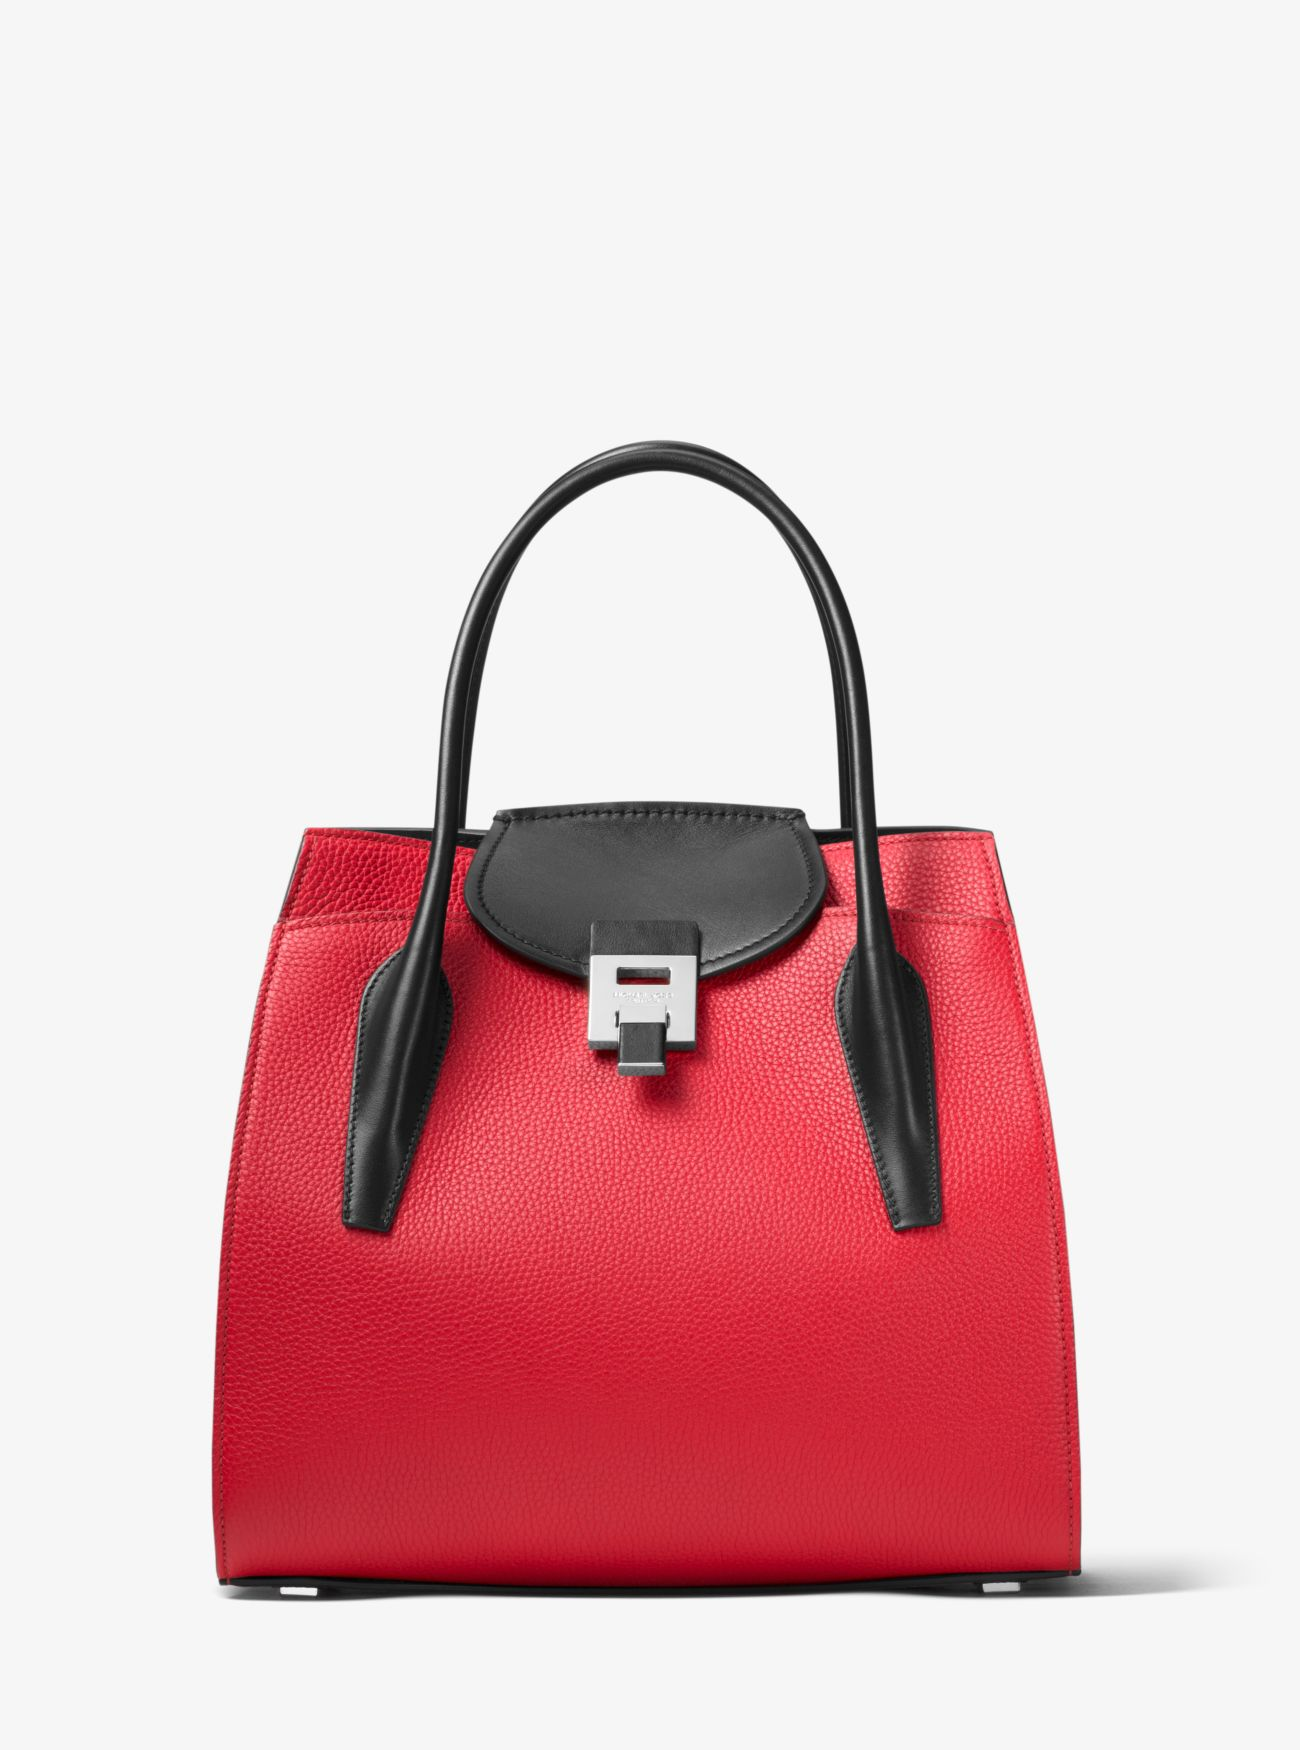 96e355336be ... Bancroft Large Calf Leather Satchel Michael Kors bags and Michael Kors  handbags Michael ...